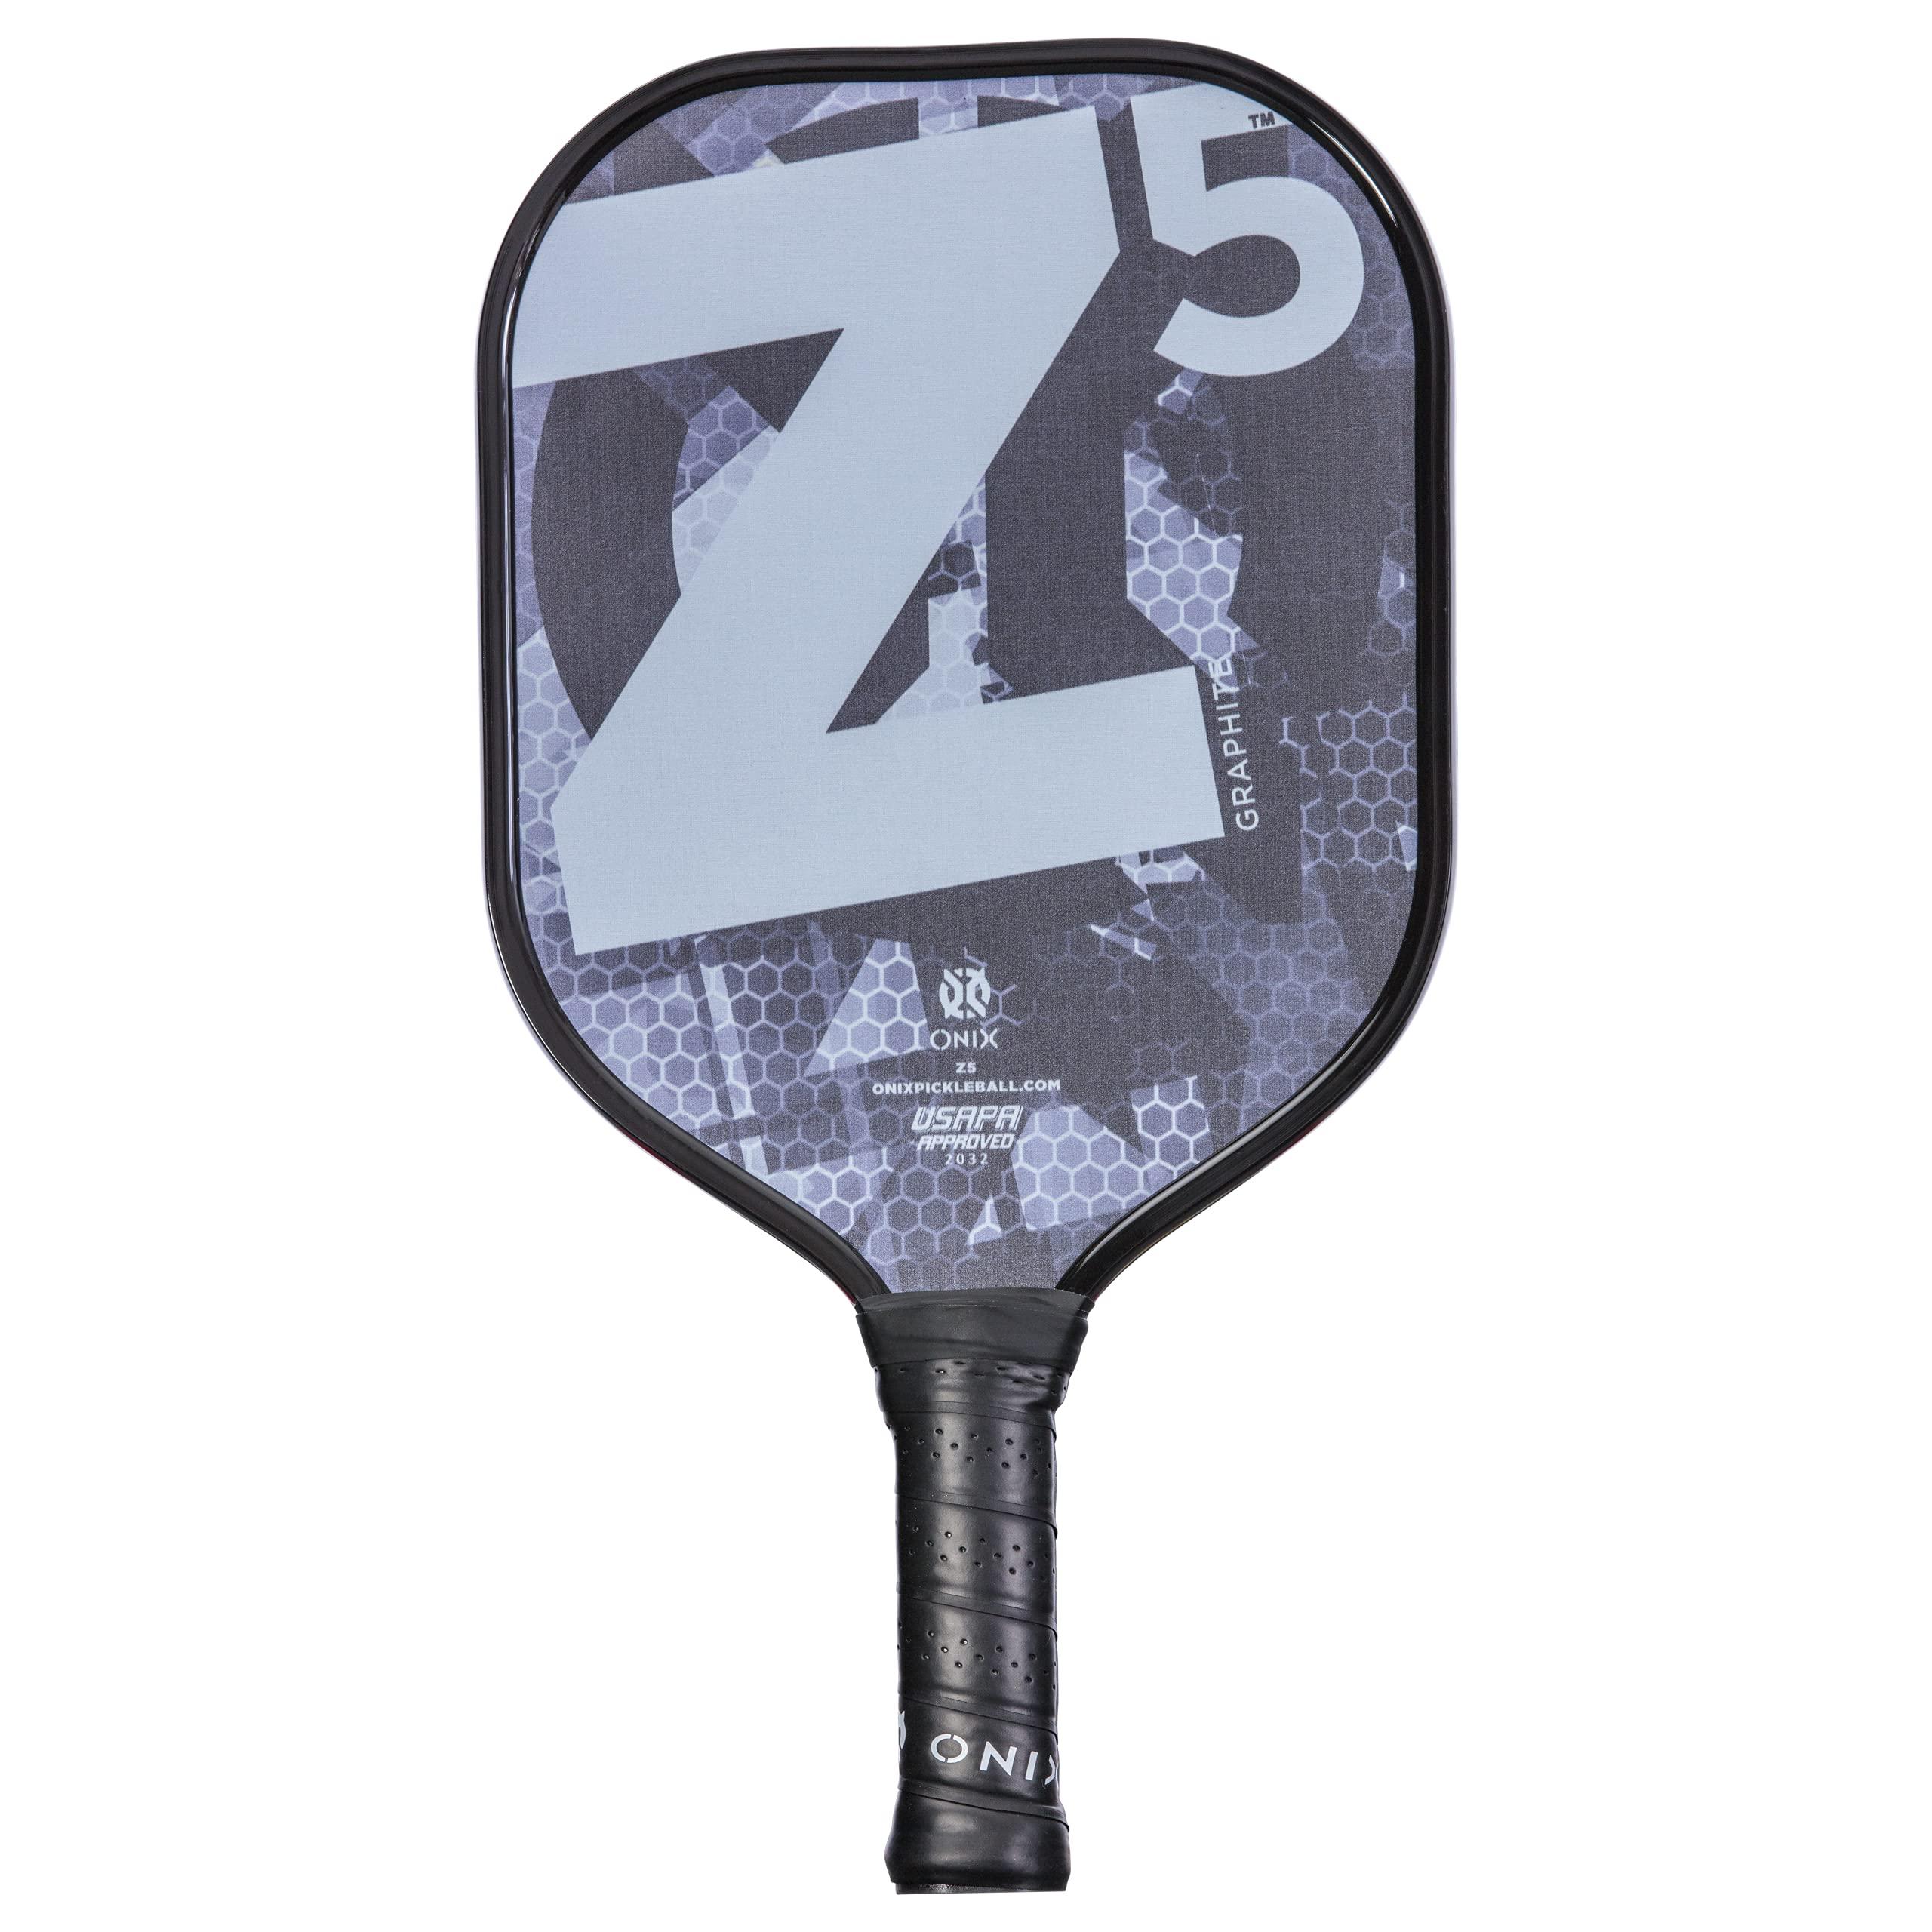 Onix Graphite Z5 Graphite Carbon Fiber Pickleball Padd -JBWV